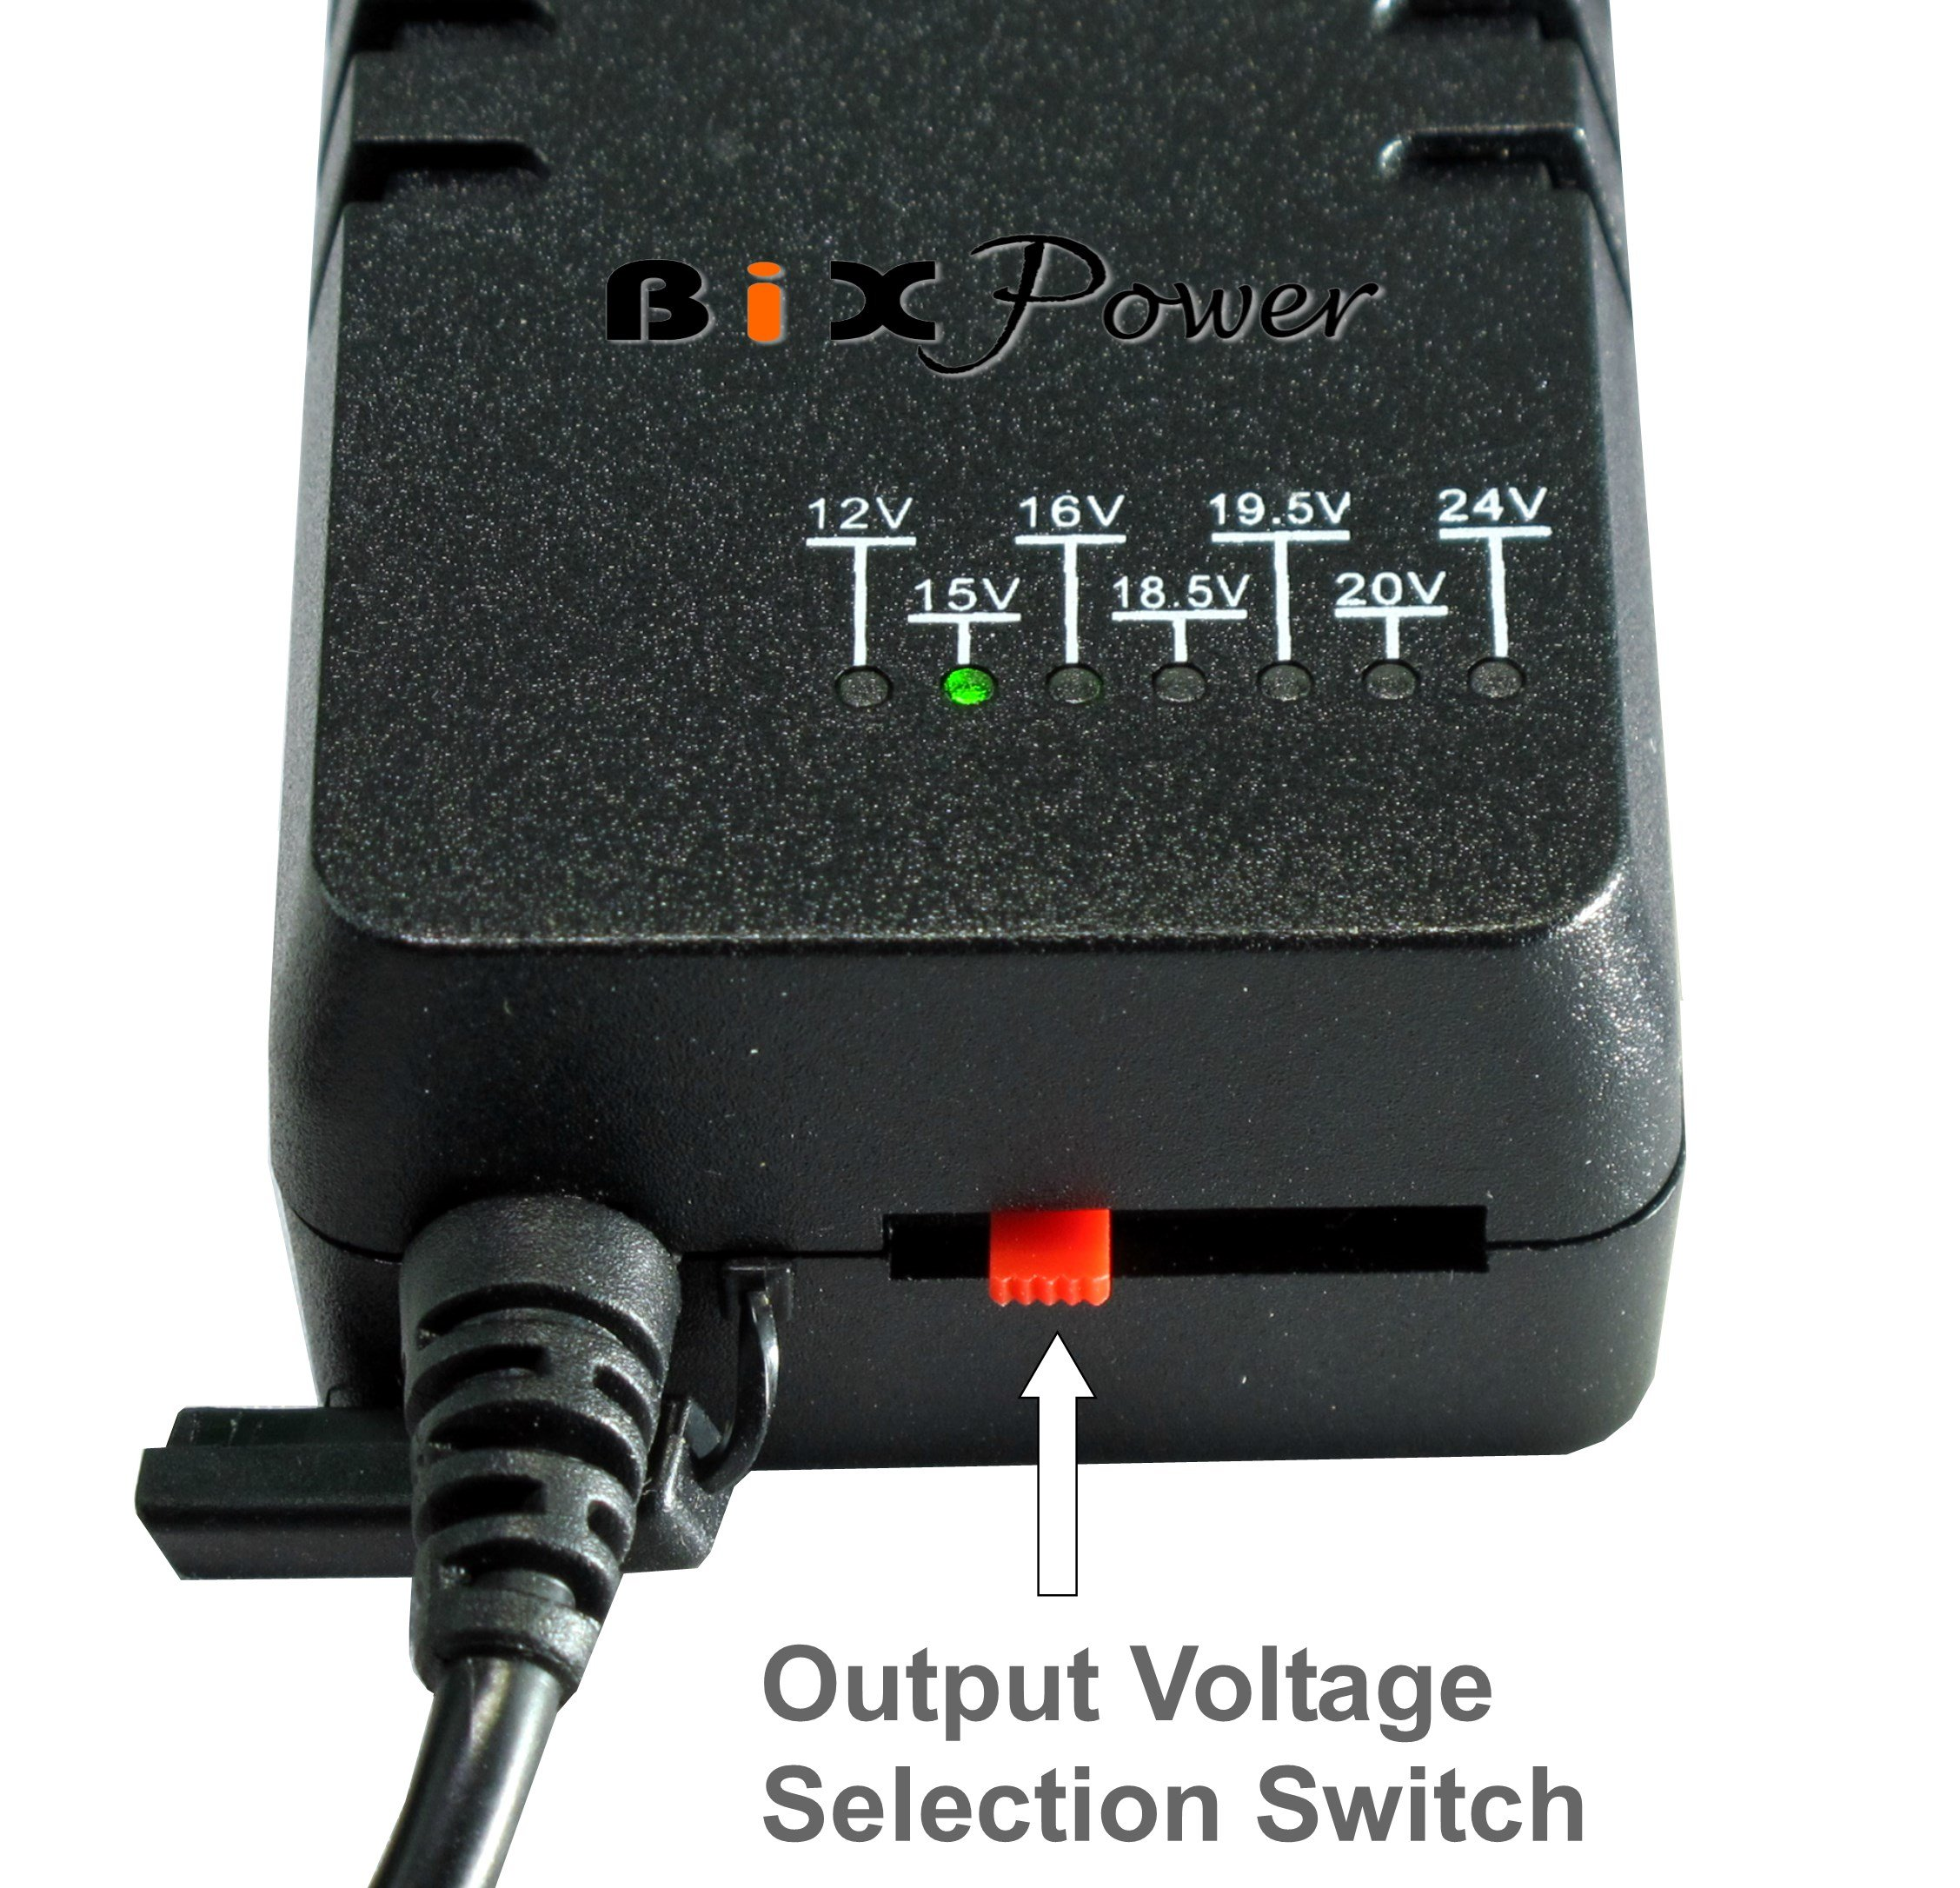 BiXPower MP330DC Battery Pack - Super Capacity 336 Watt-hour Light Weight Battery with Multi Output Voltages (12v/15v/16v/18v/19v/24v) Power Converter Combo Kit by BiXPower (Image #4)